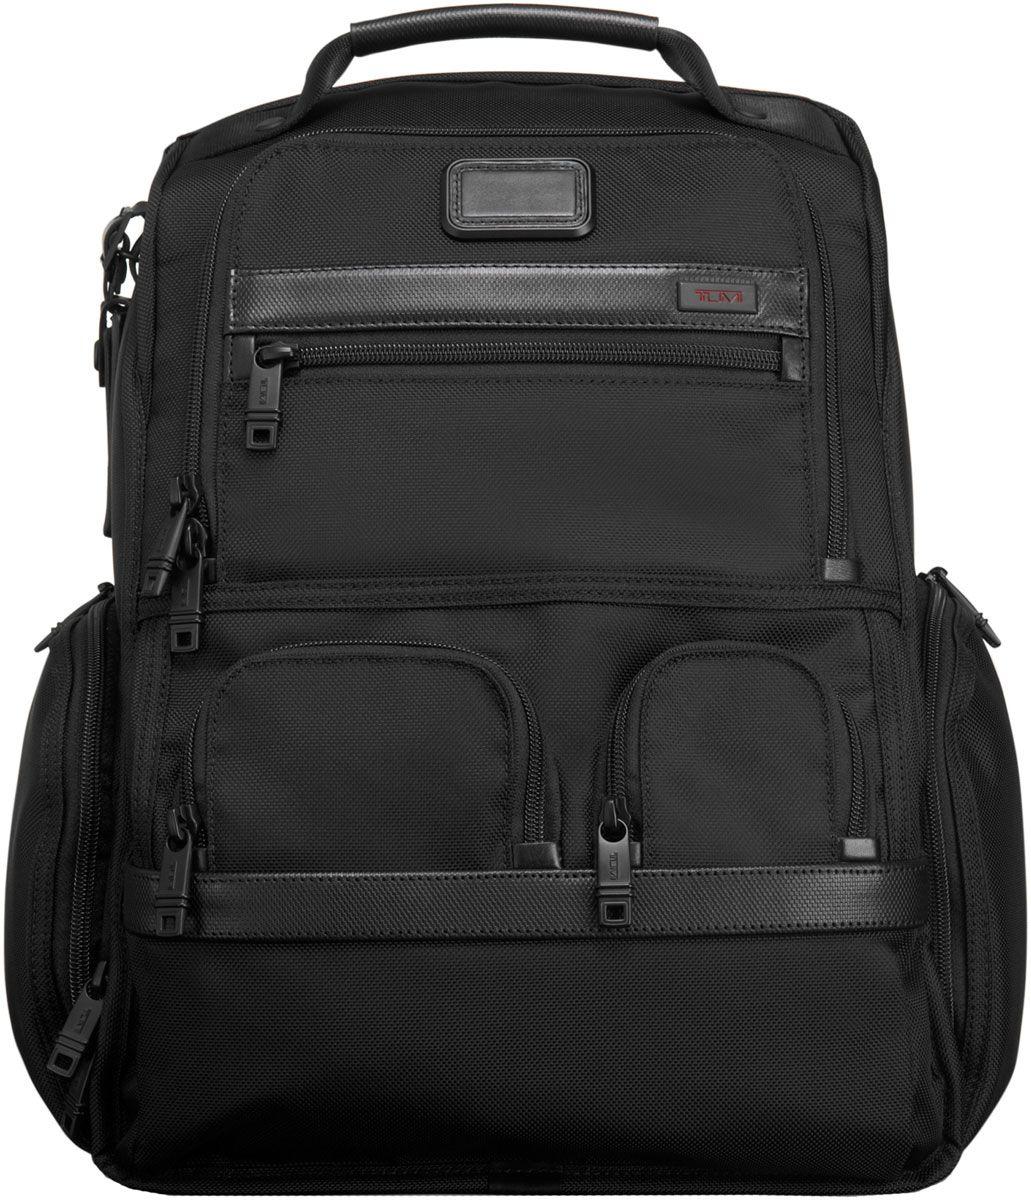 Tumi Black Alpha 2 Laptop Brief Pack - 026173 BLACK